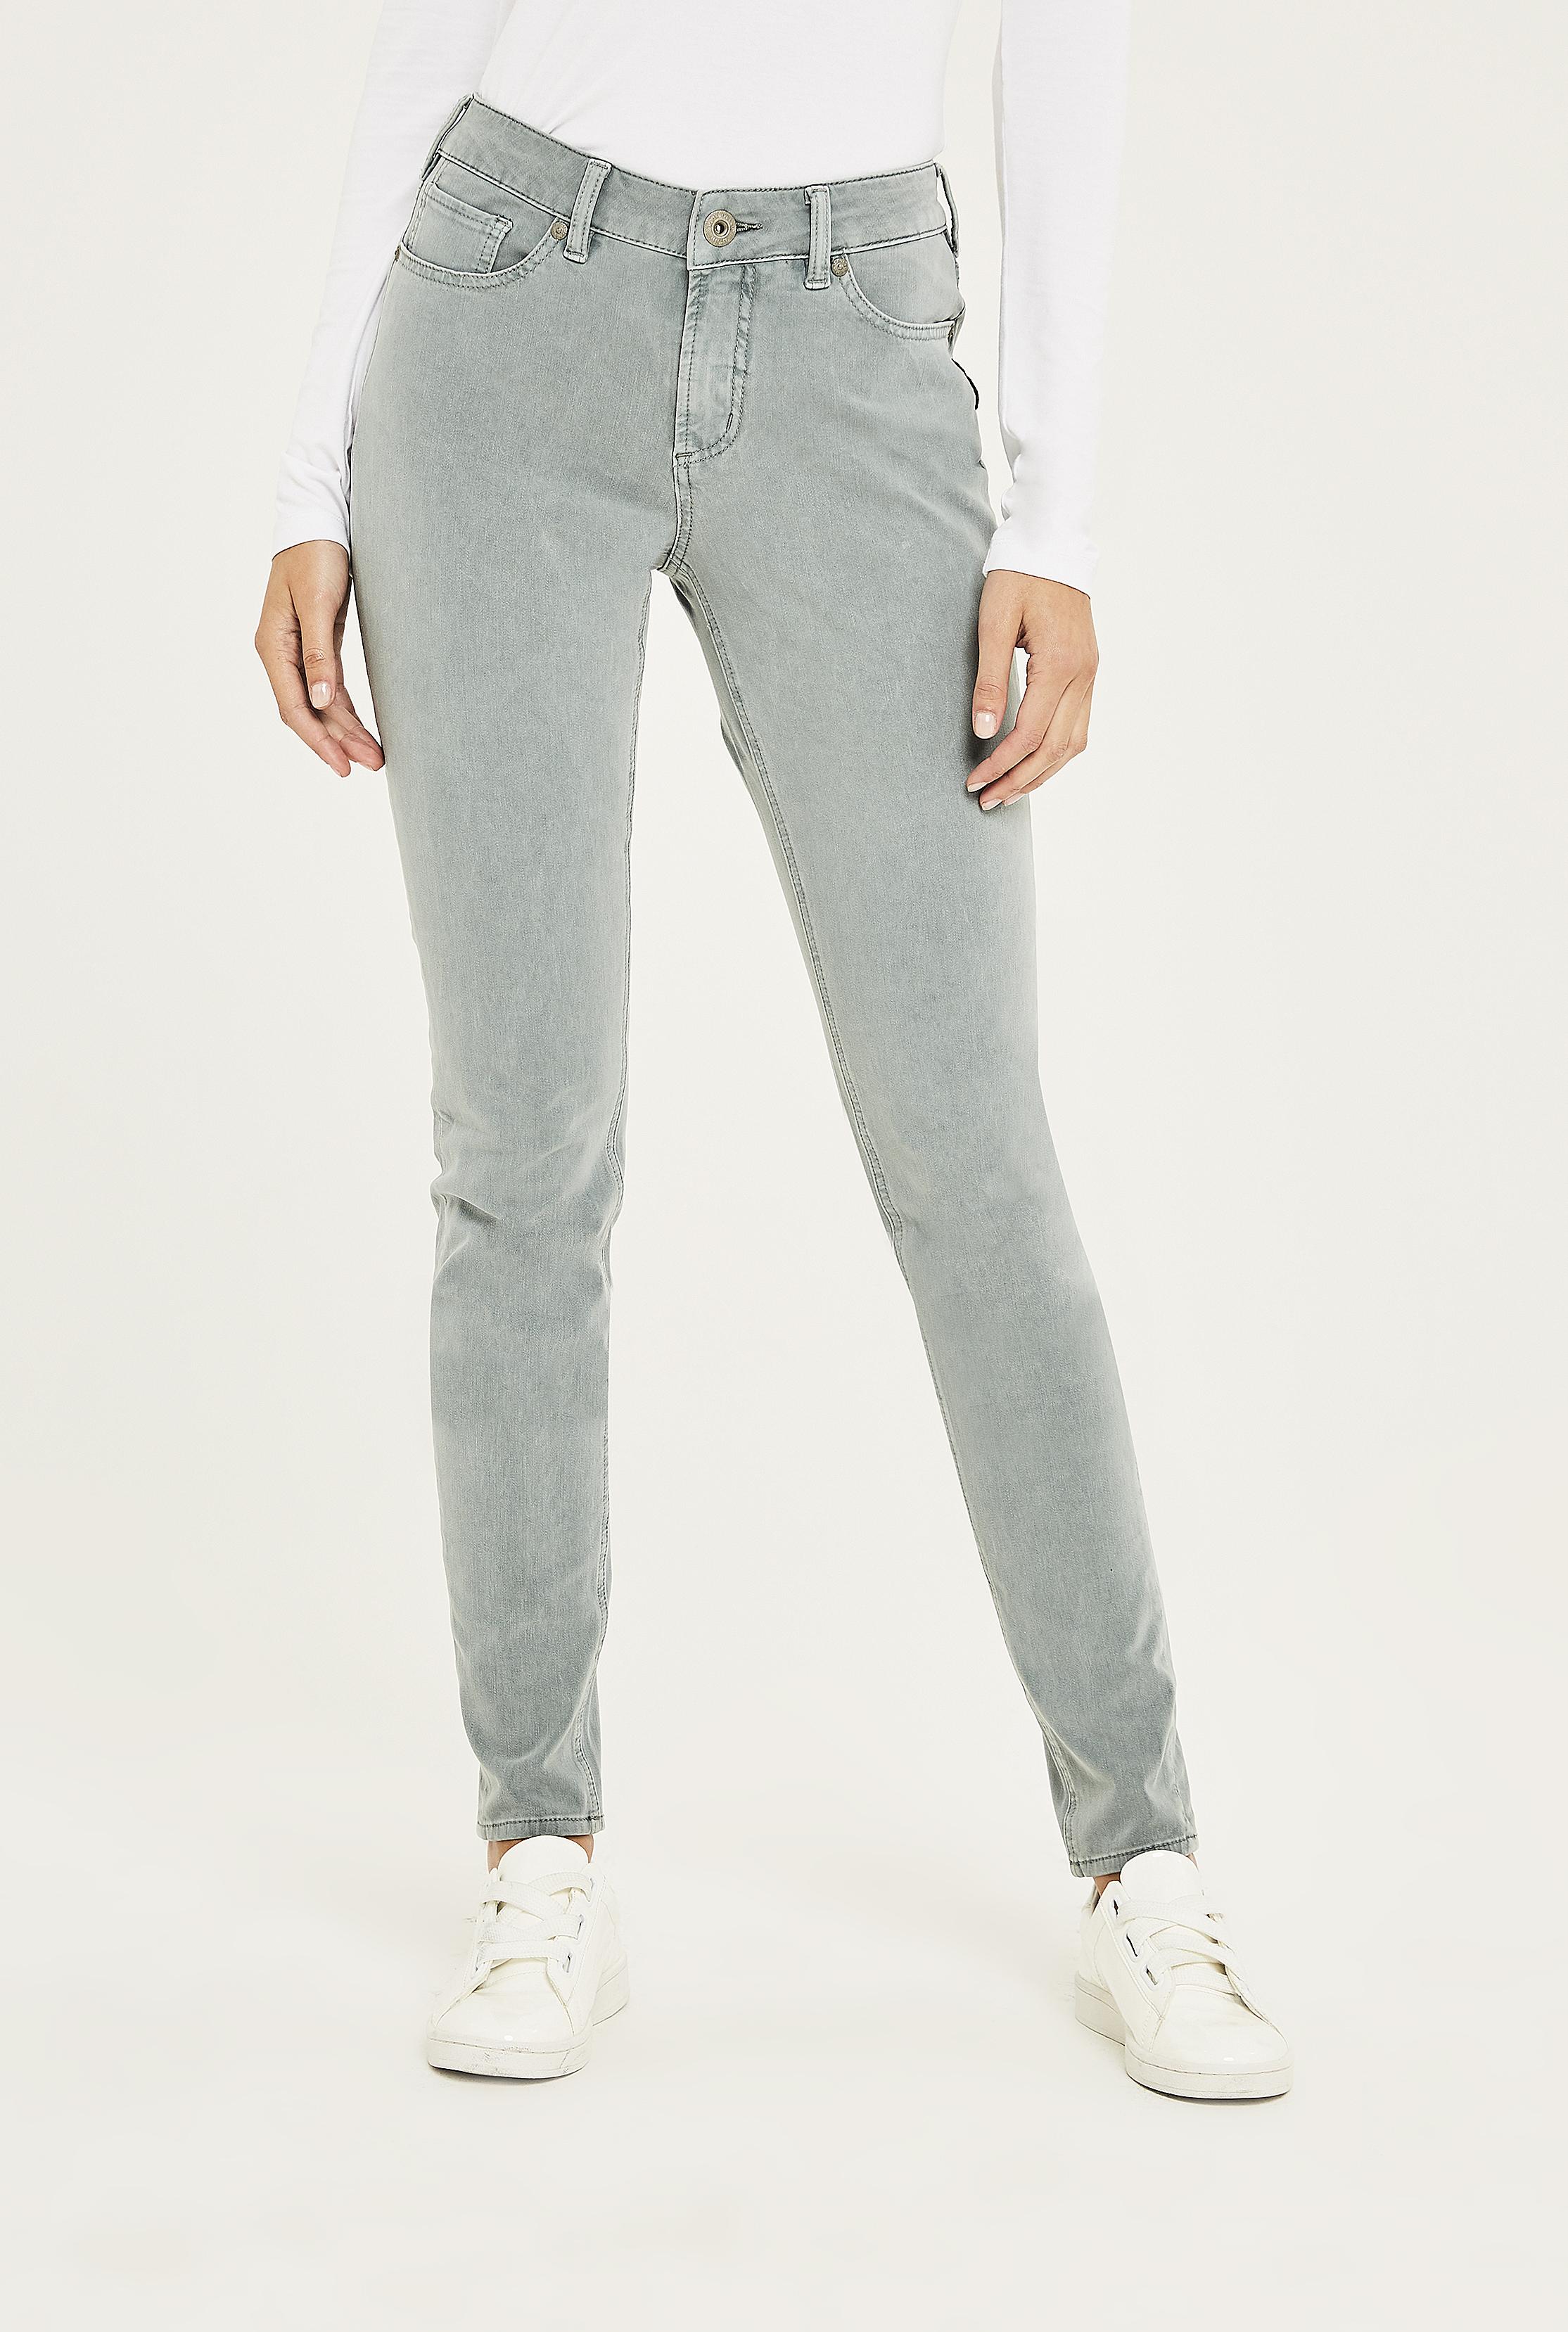 SILVER JEANS Sage Elyse Super Skinny Jean